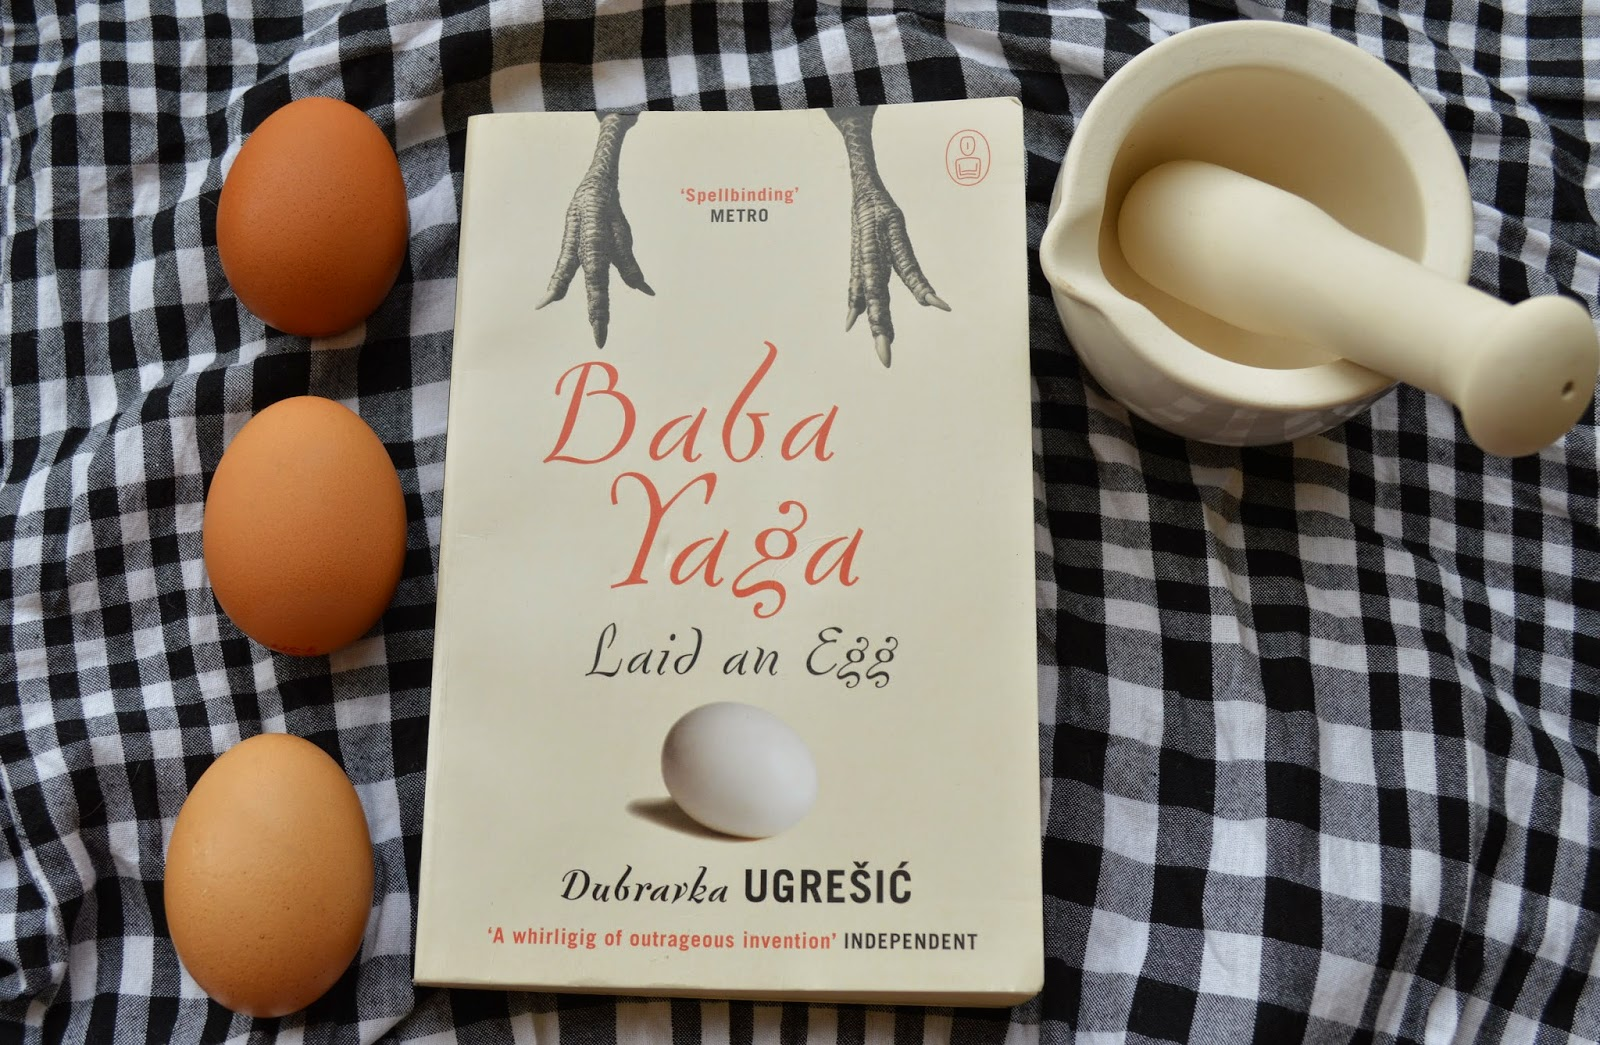 baba yaga laid an egg, Dubravka Ugresic, Slavic fairytales, Cannongate, myths, legends, folktale, review, UK edition, book, literature, photo, photograph, Baba Yaga, witch, Russian, Bulgaria, Croatia